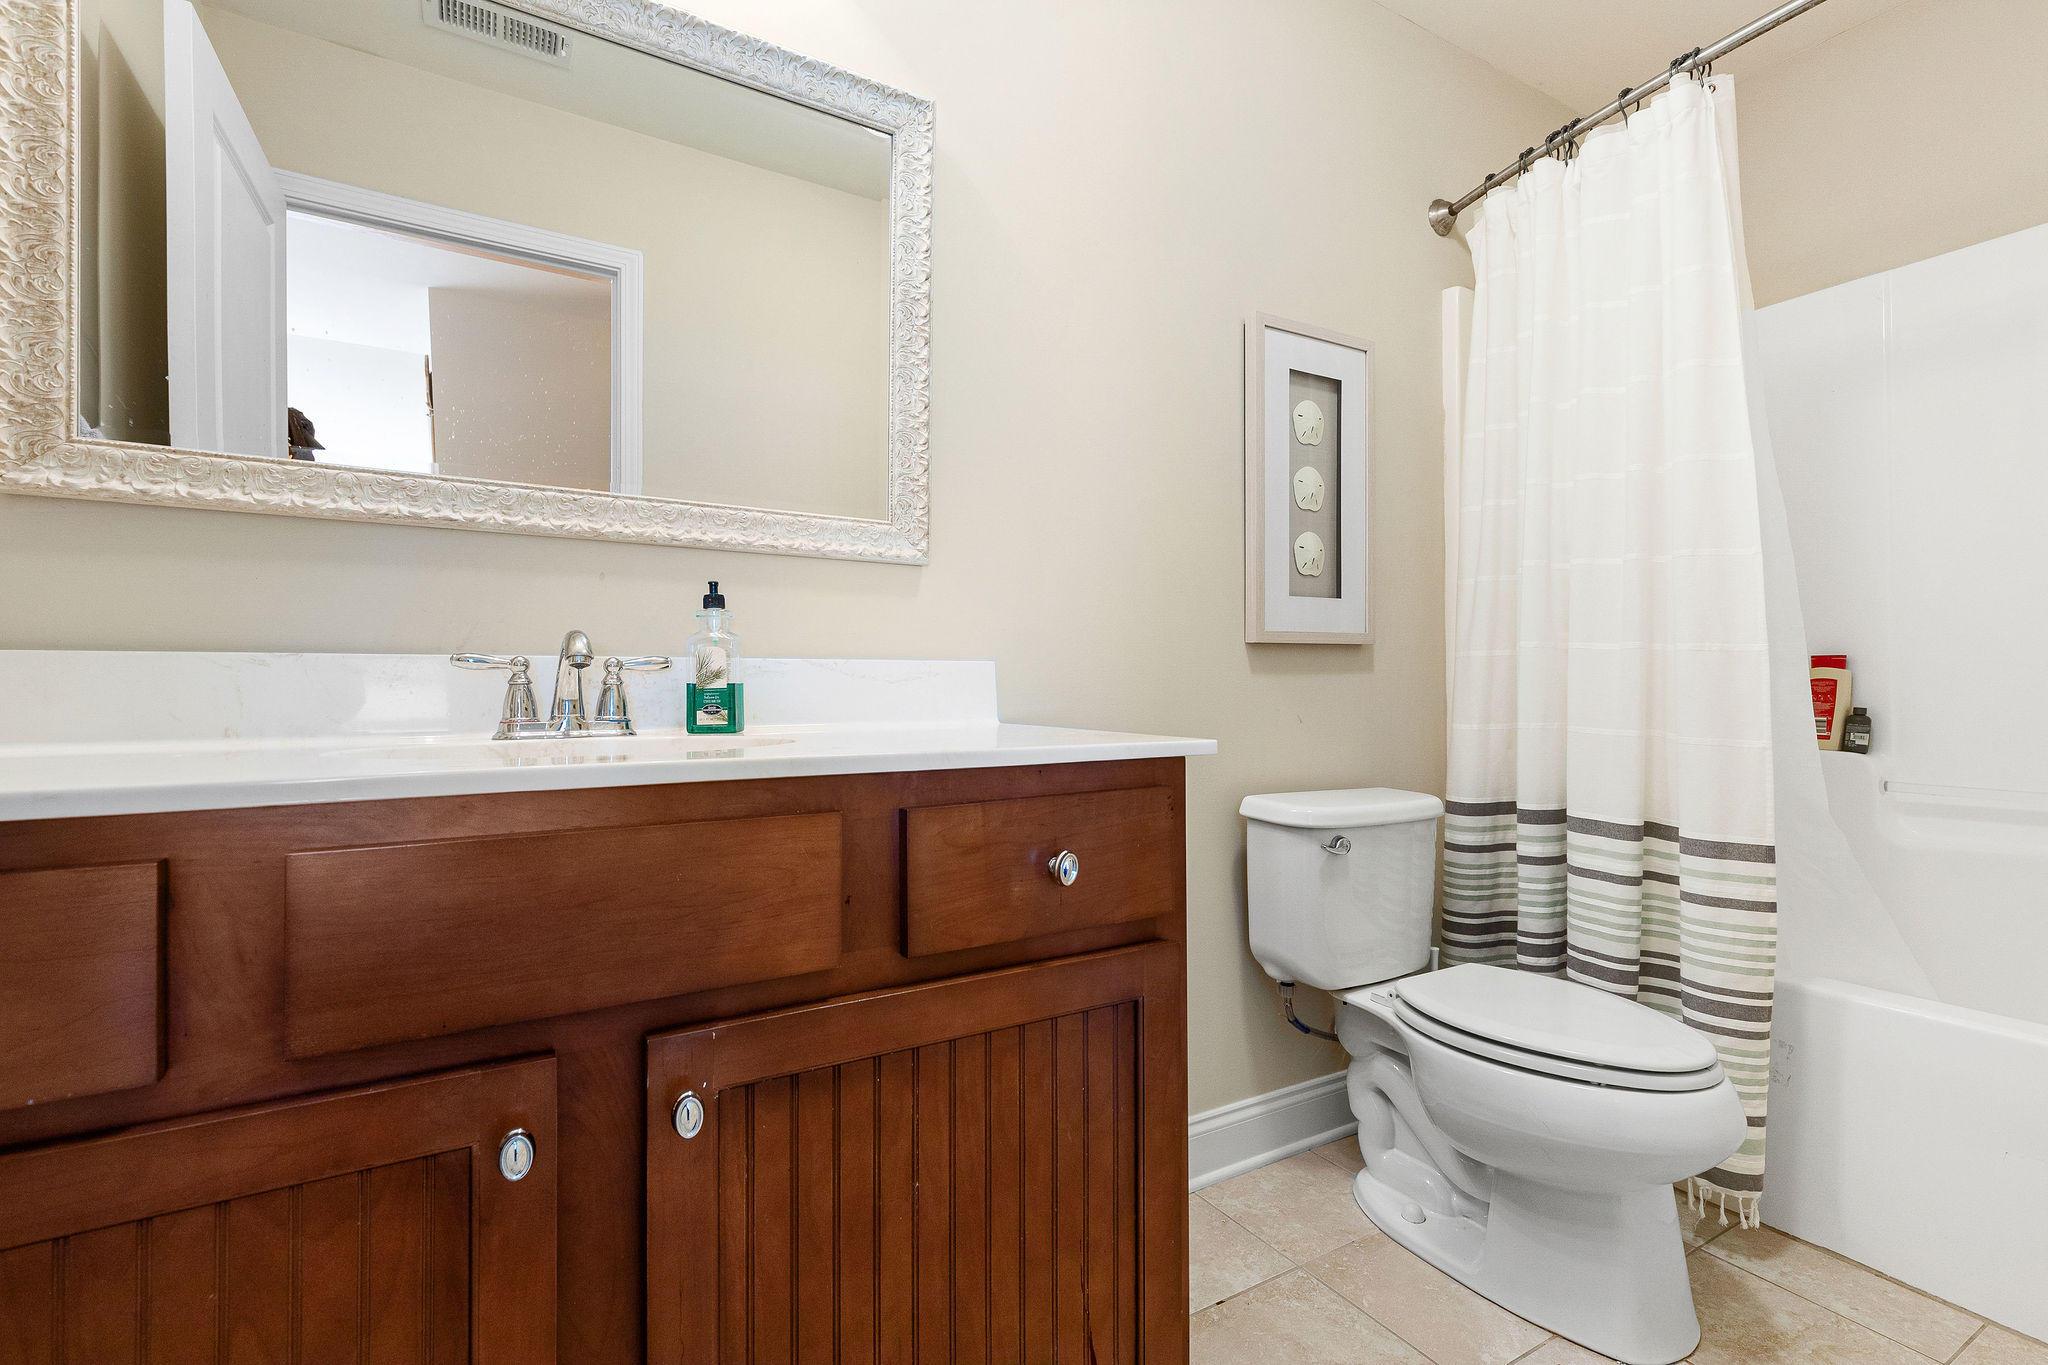 Dunes West Homes For Sale - 3212 Hatchway, Mount Pleasant, SC - 57